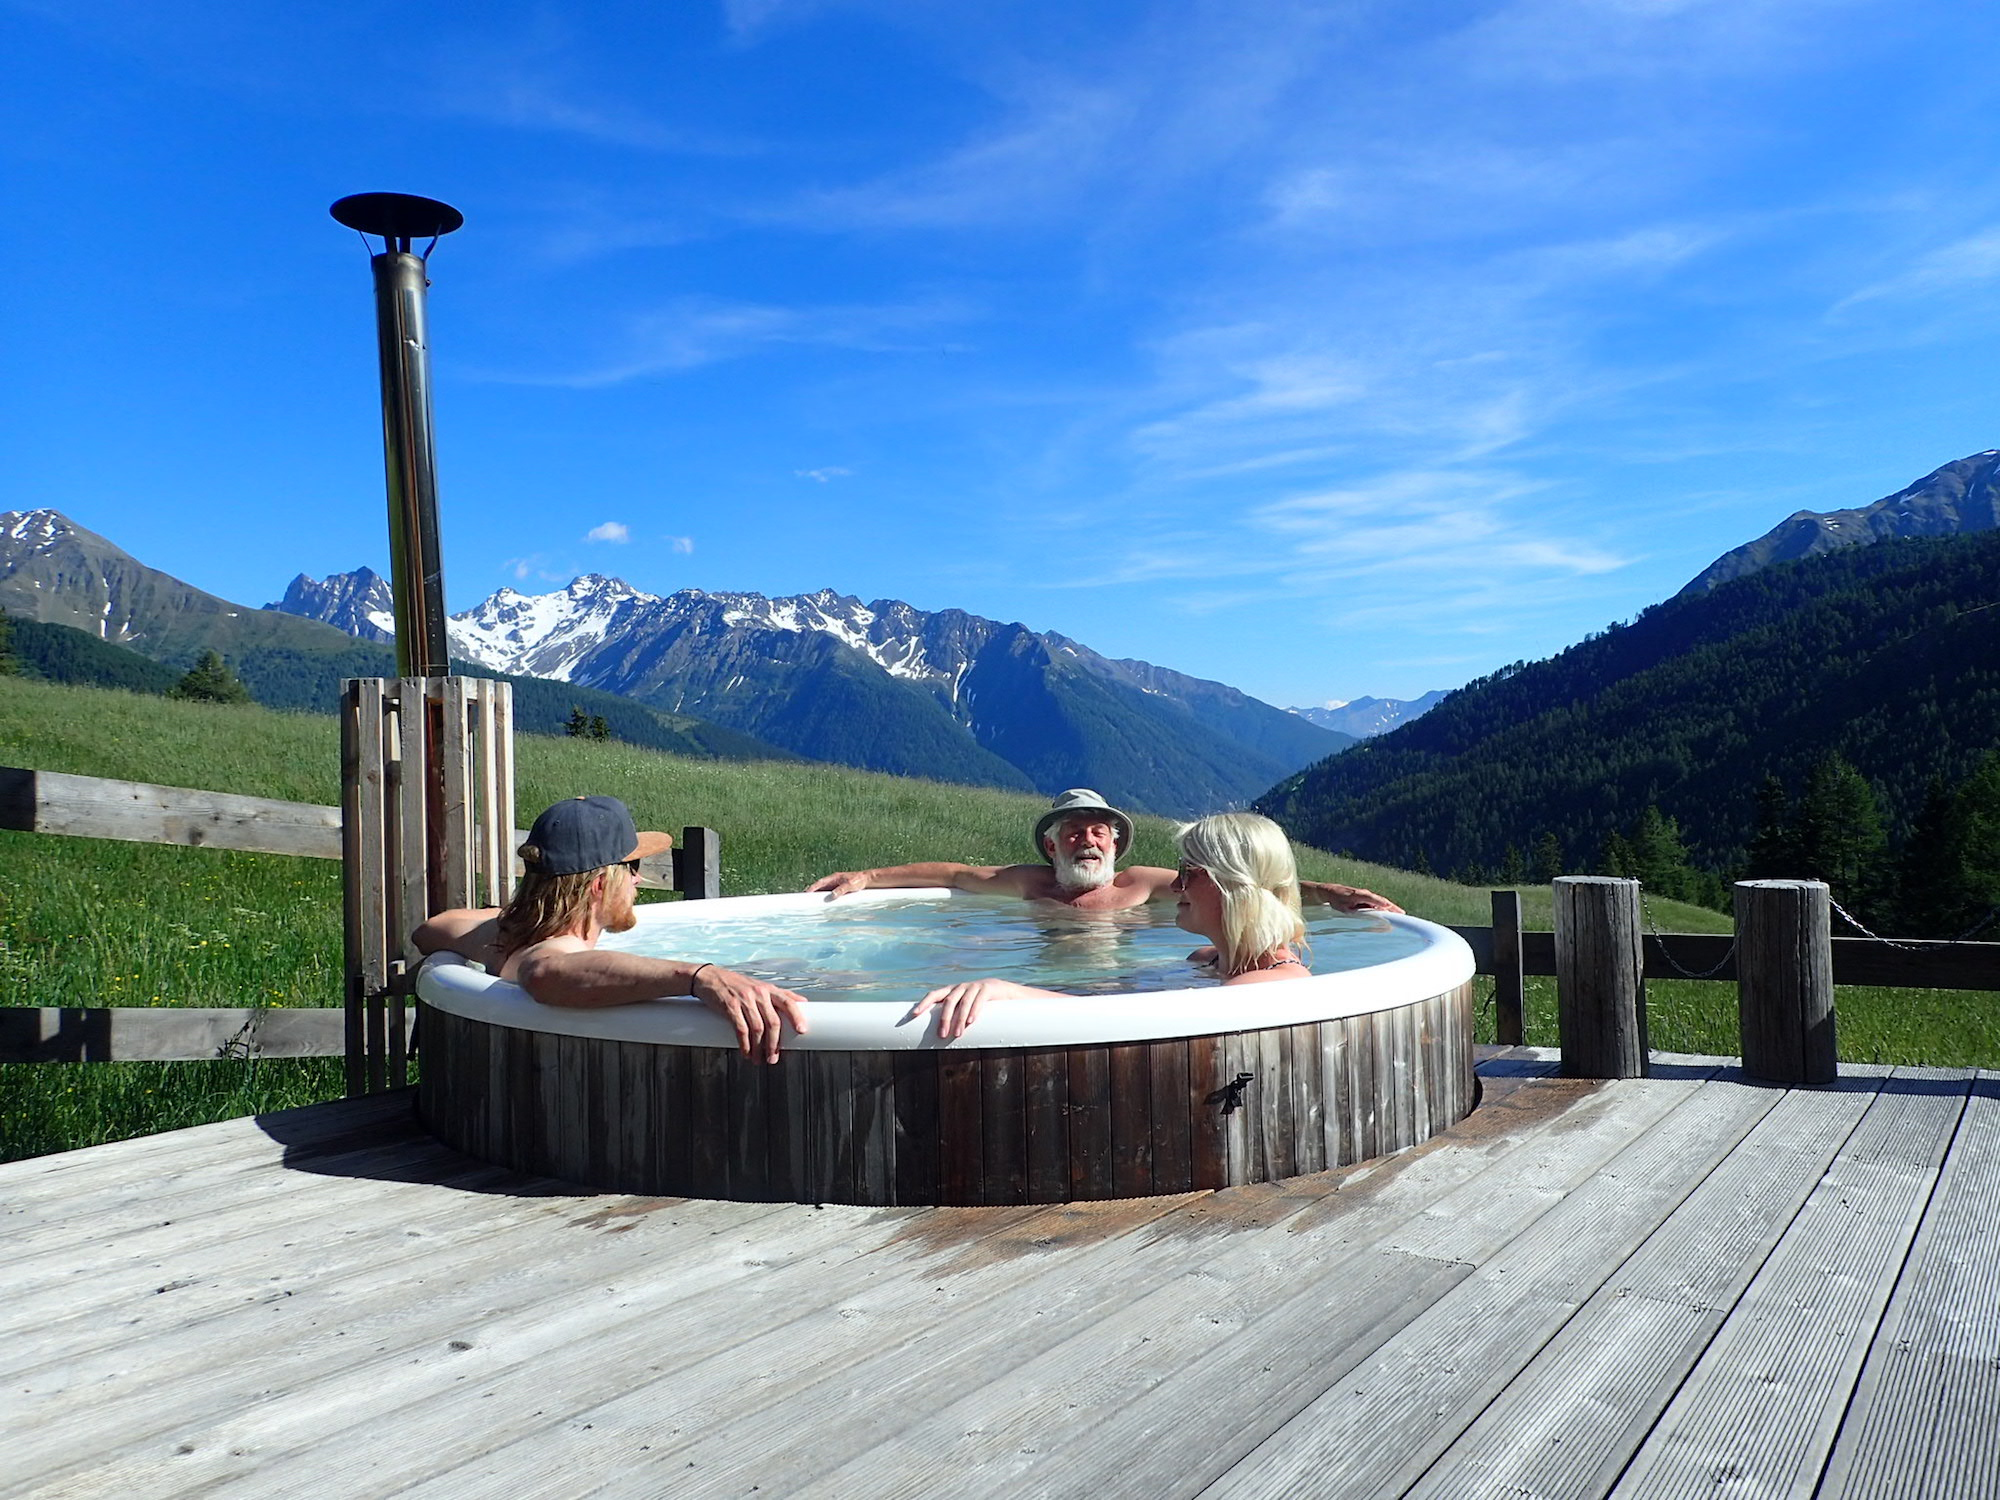 Relaxing at MoaAlm mountain retreat